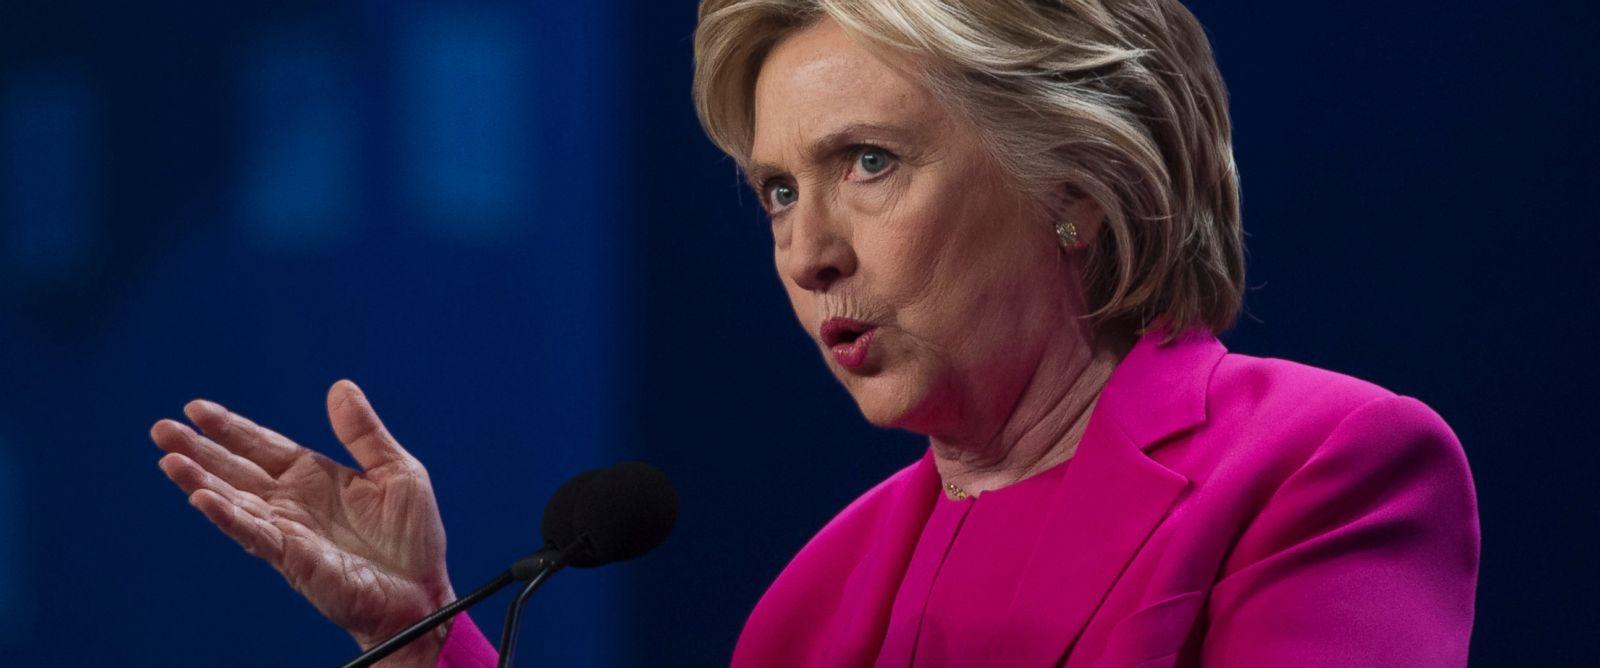 PHOTO: Hillary Clinton addresses the The National Education Association (NEA) Representative Assembly in Washington, July 5, 2016.